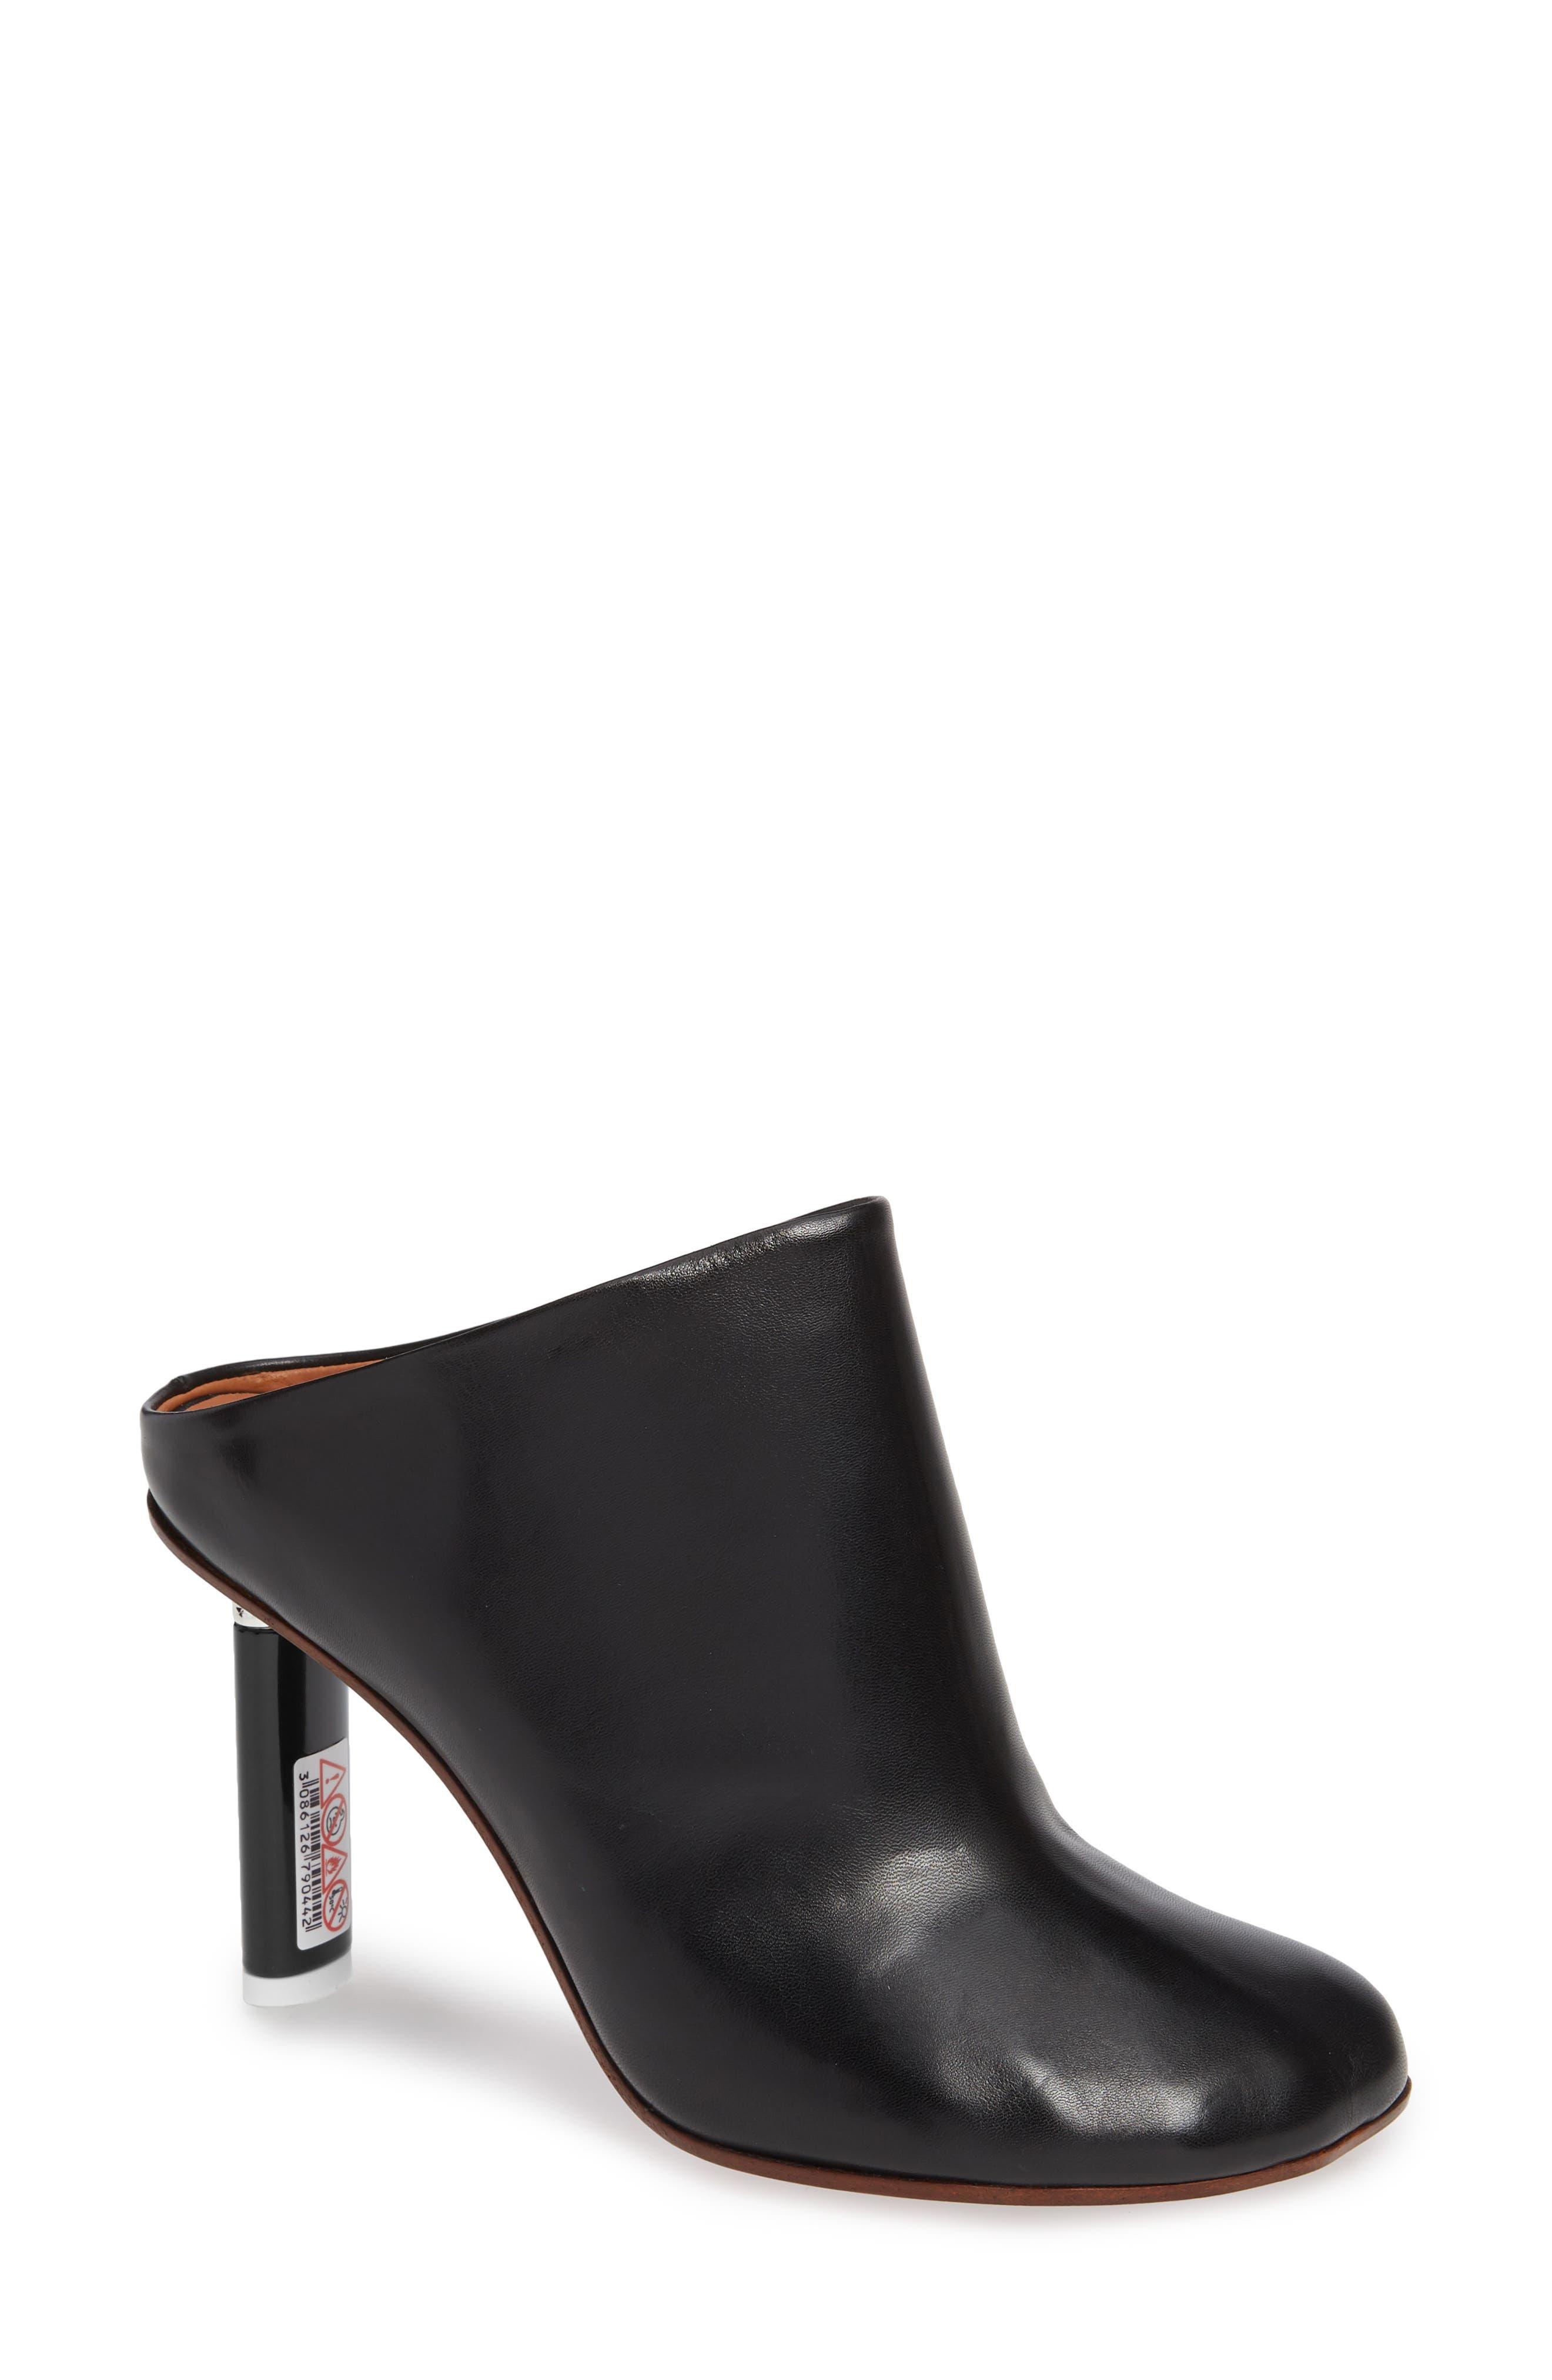 Lighter Heel Mule,                             Main thumbnail 1, color,                             BLACK/ BLACK HEEL